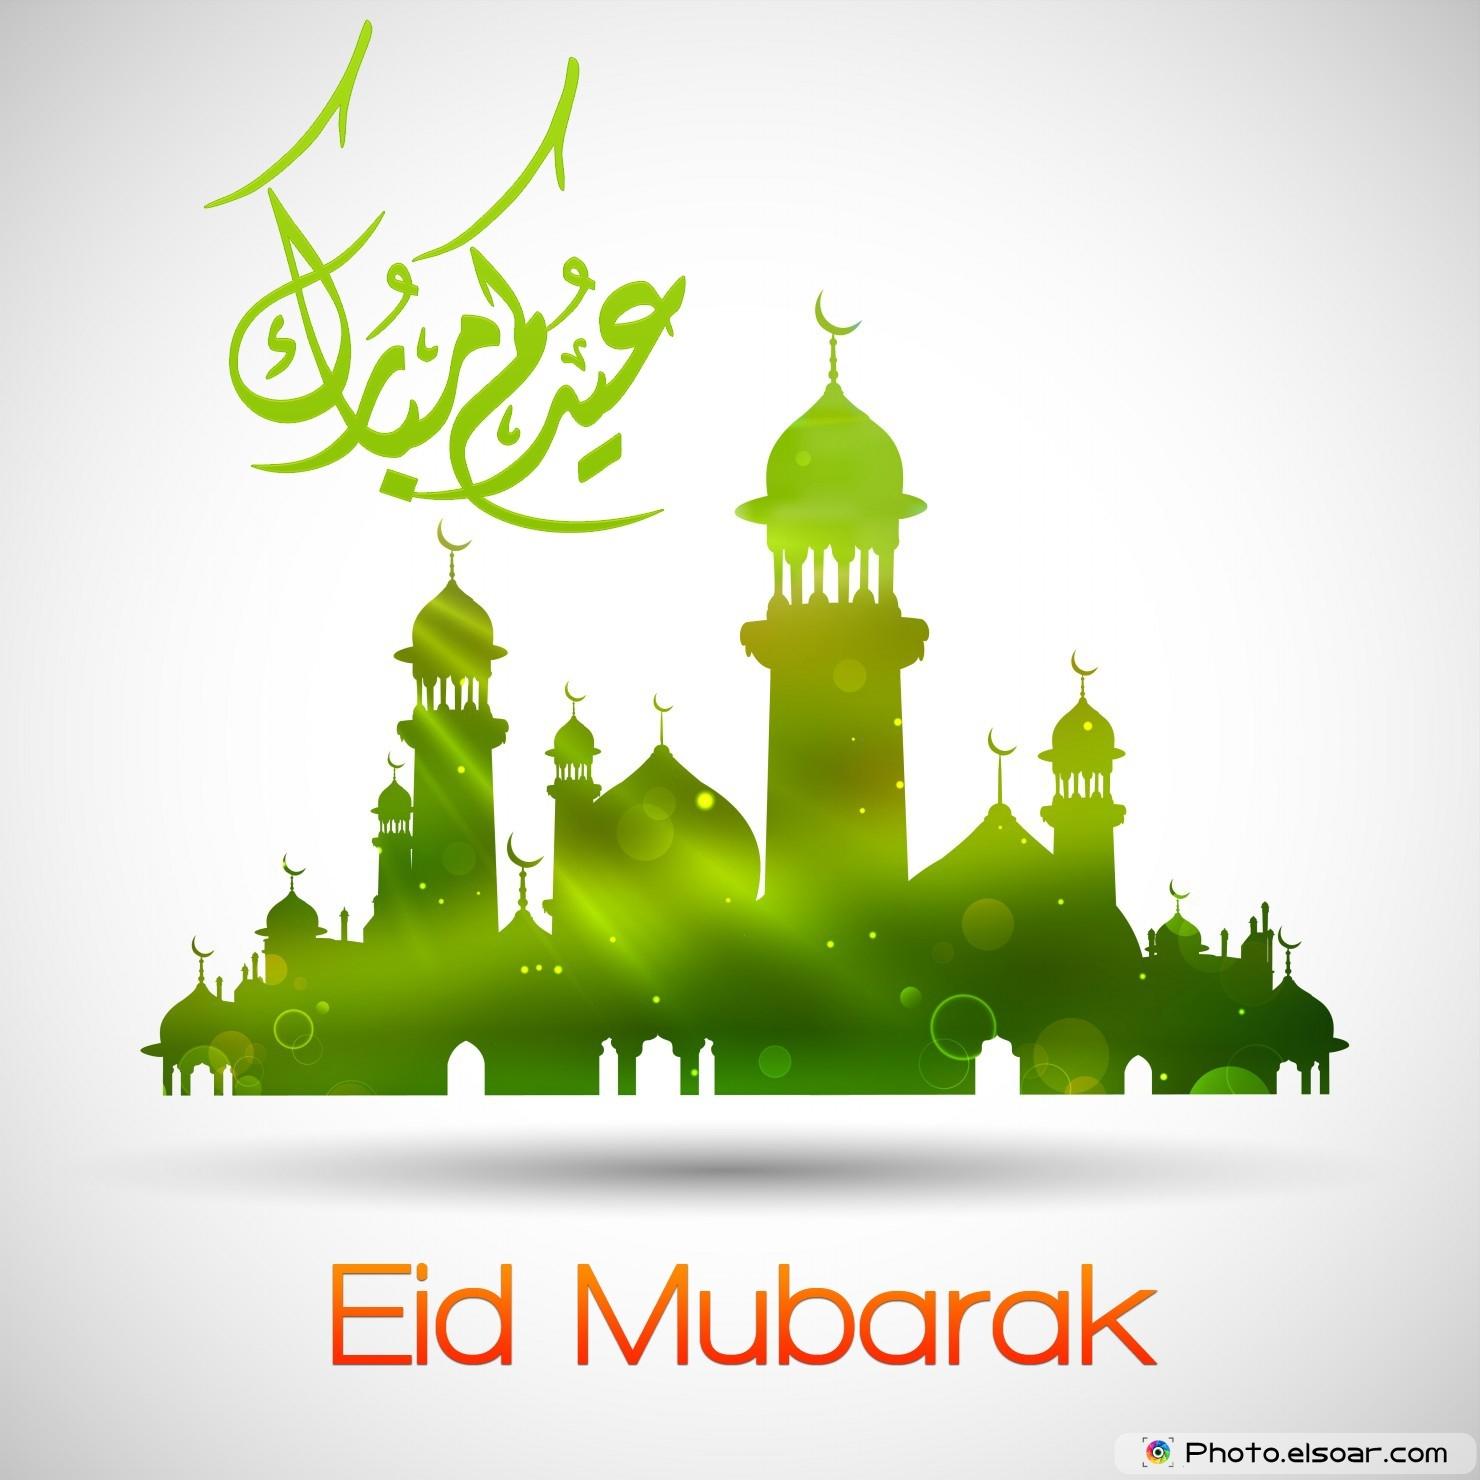 Best Eid Mubarak Hd Desktop Wallpaper Transparent Eid Background Png 1480x1480 Wallpaper Teahub Io